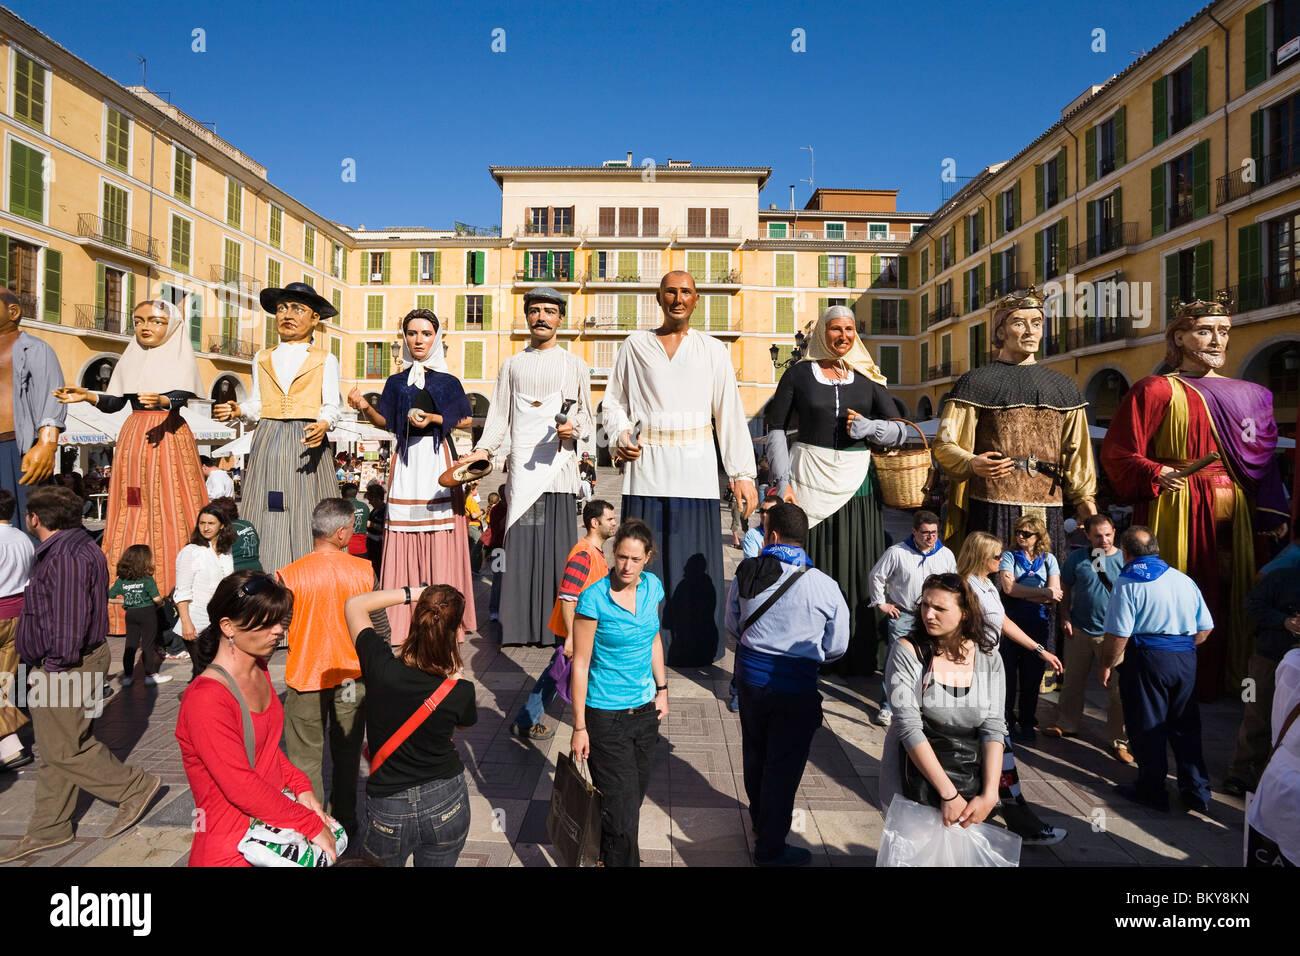 Figures with masks at a square, Diada per la Llengua, Placa Major, Palma, Mallorca, Spain, Europe - Stock Image